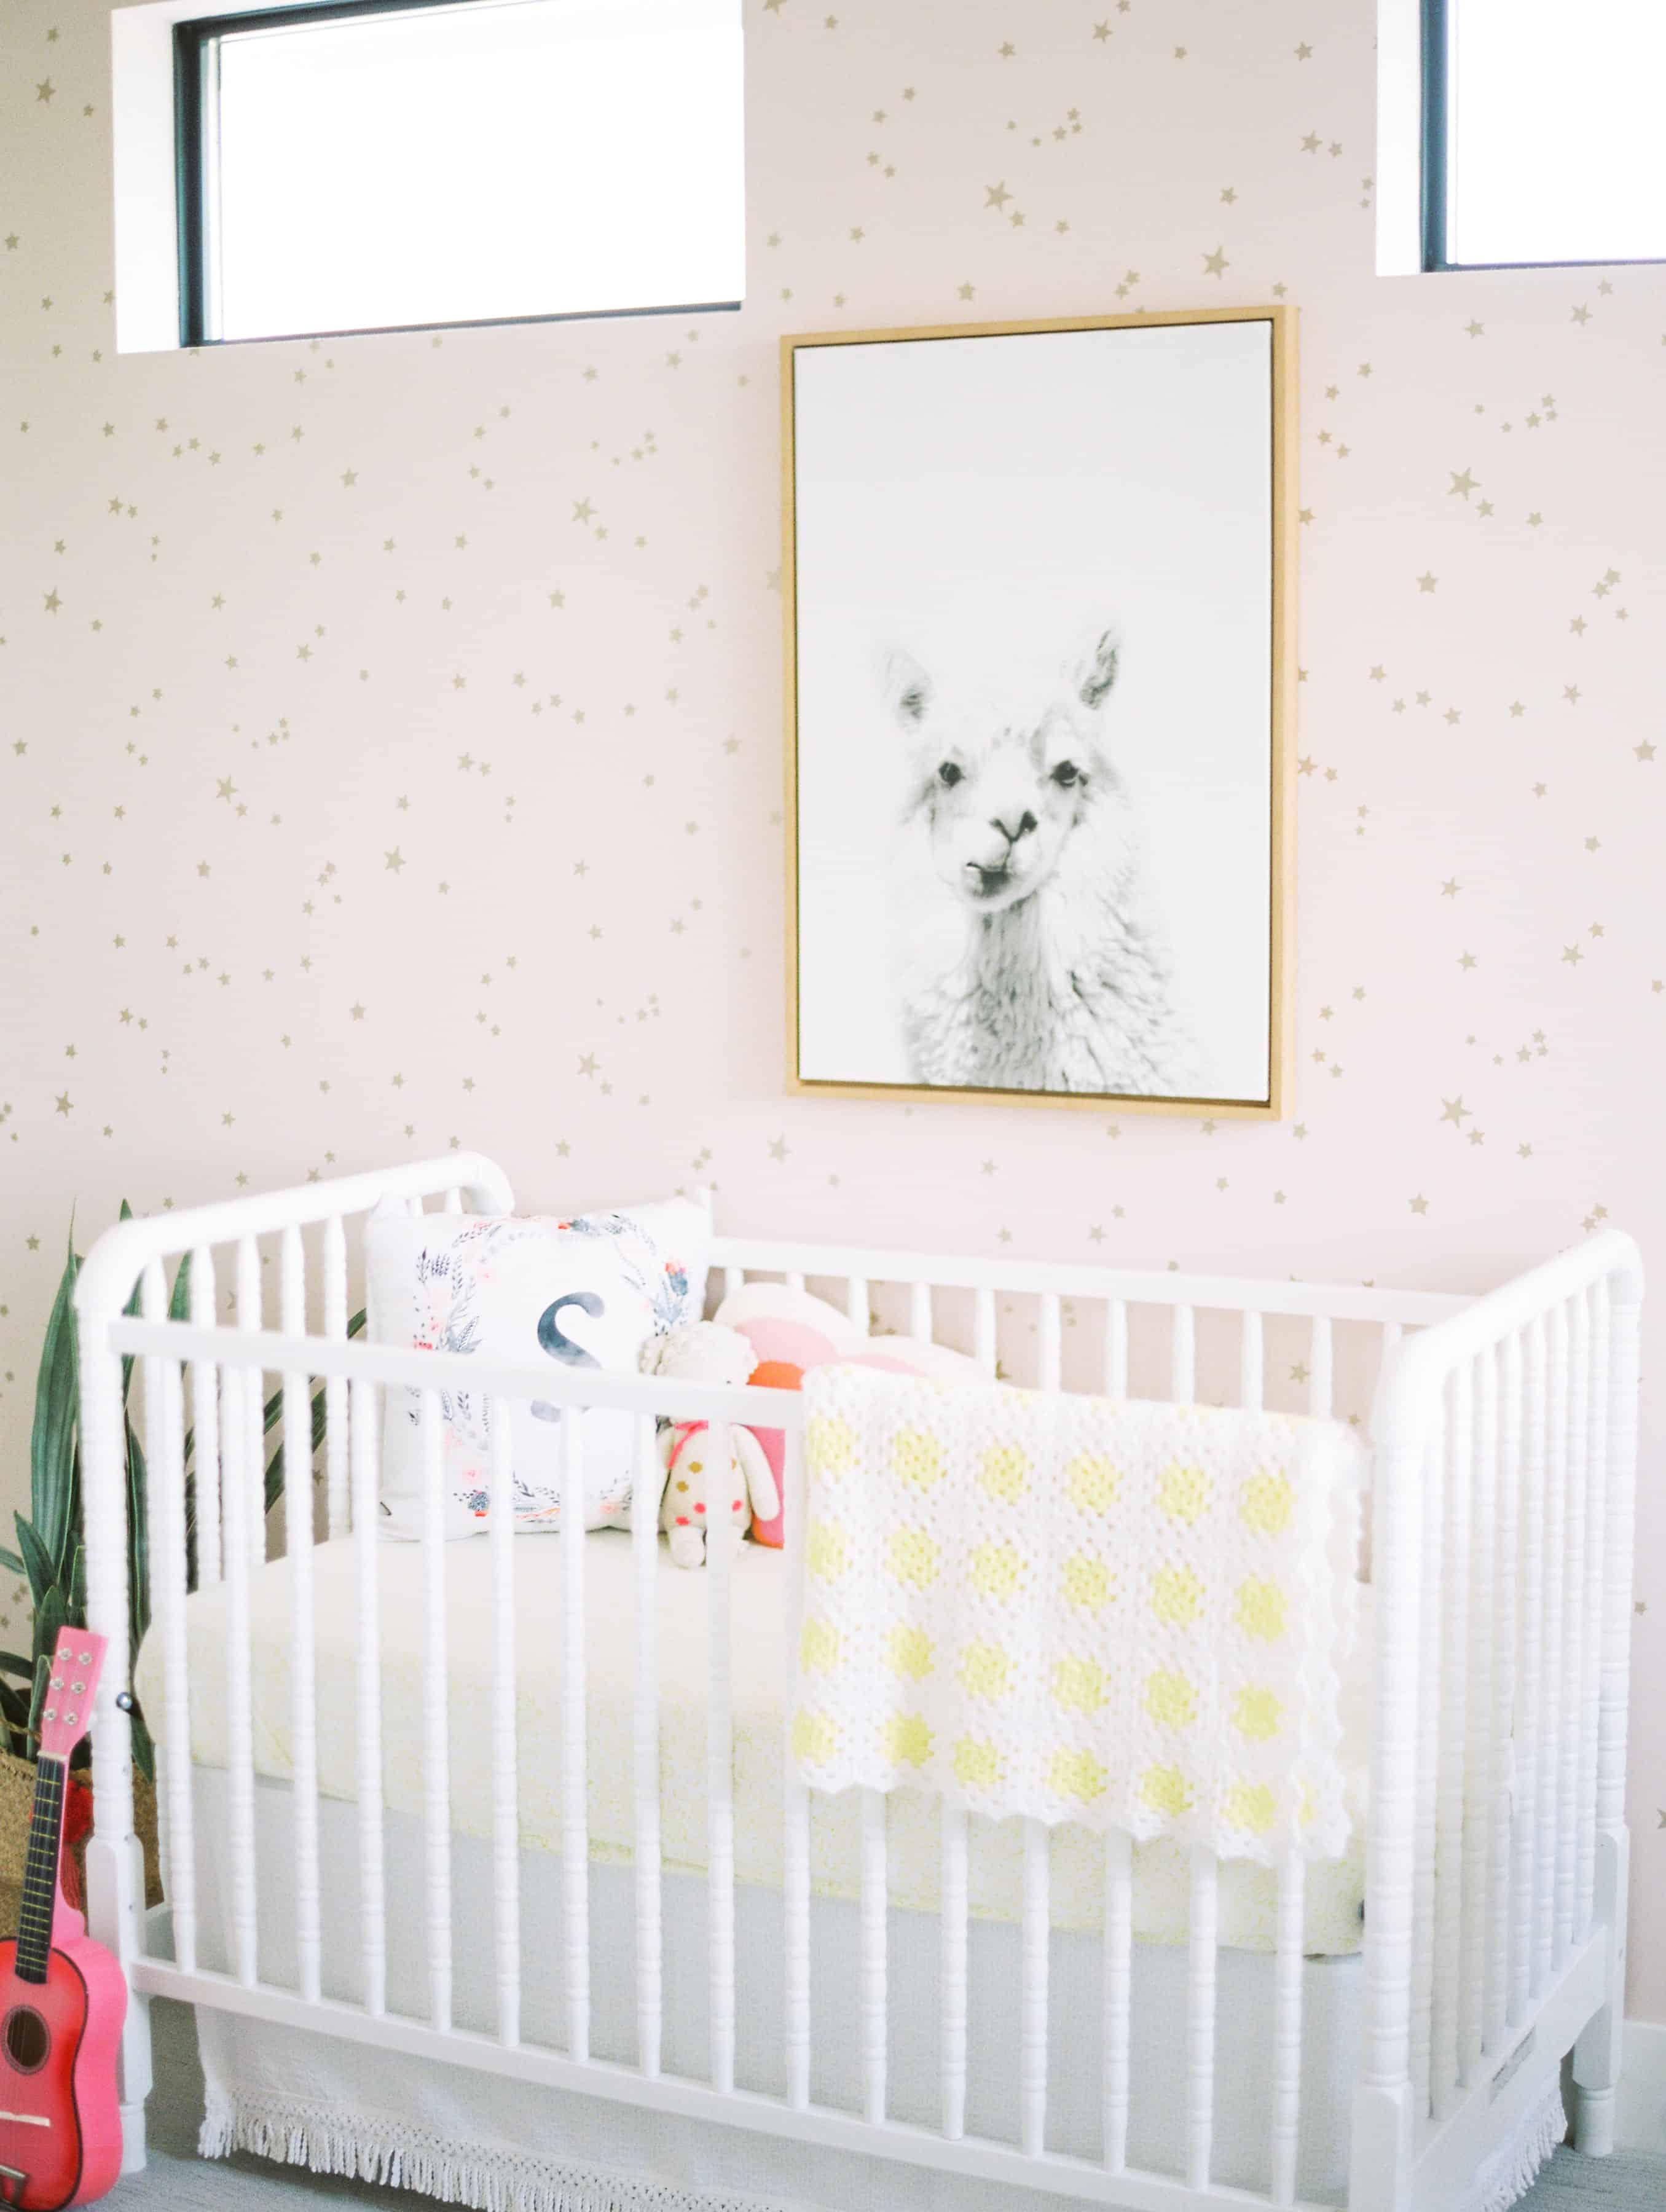 Alpaca picture in nursery